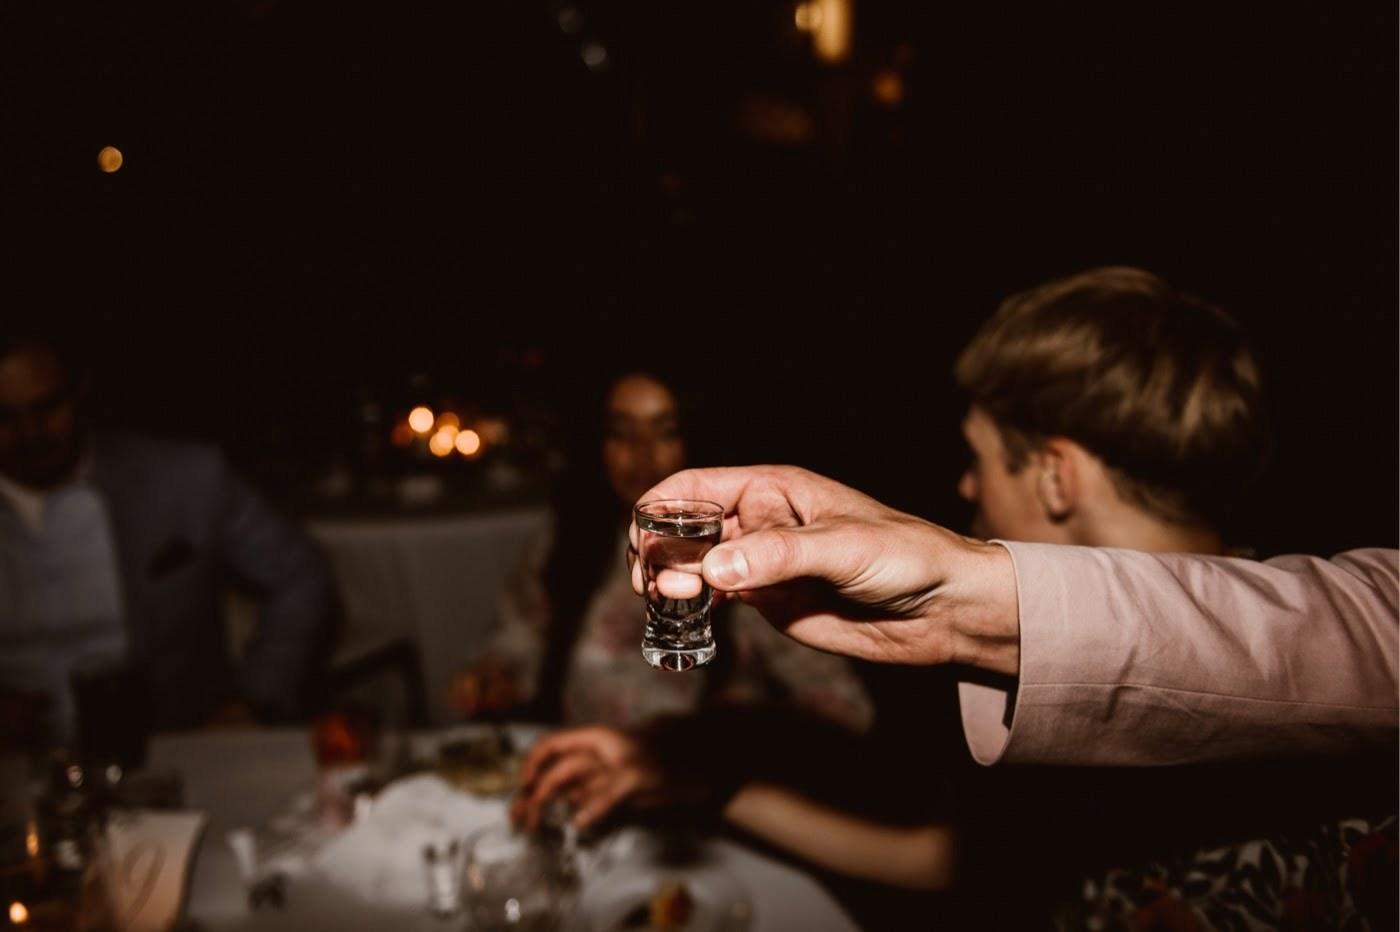 ewelina zieba rustykalne wesele stara oranzeria warszawa 082